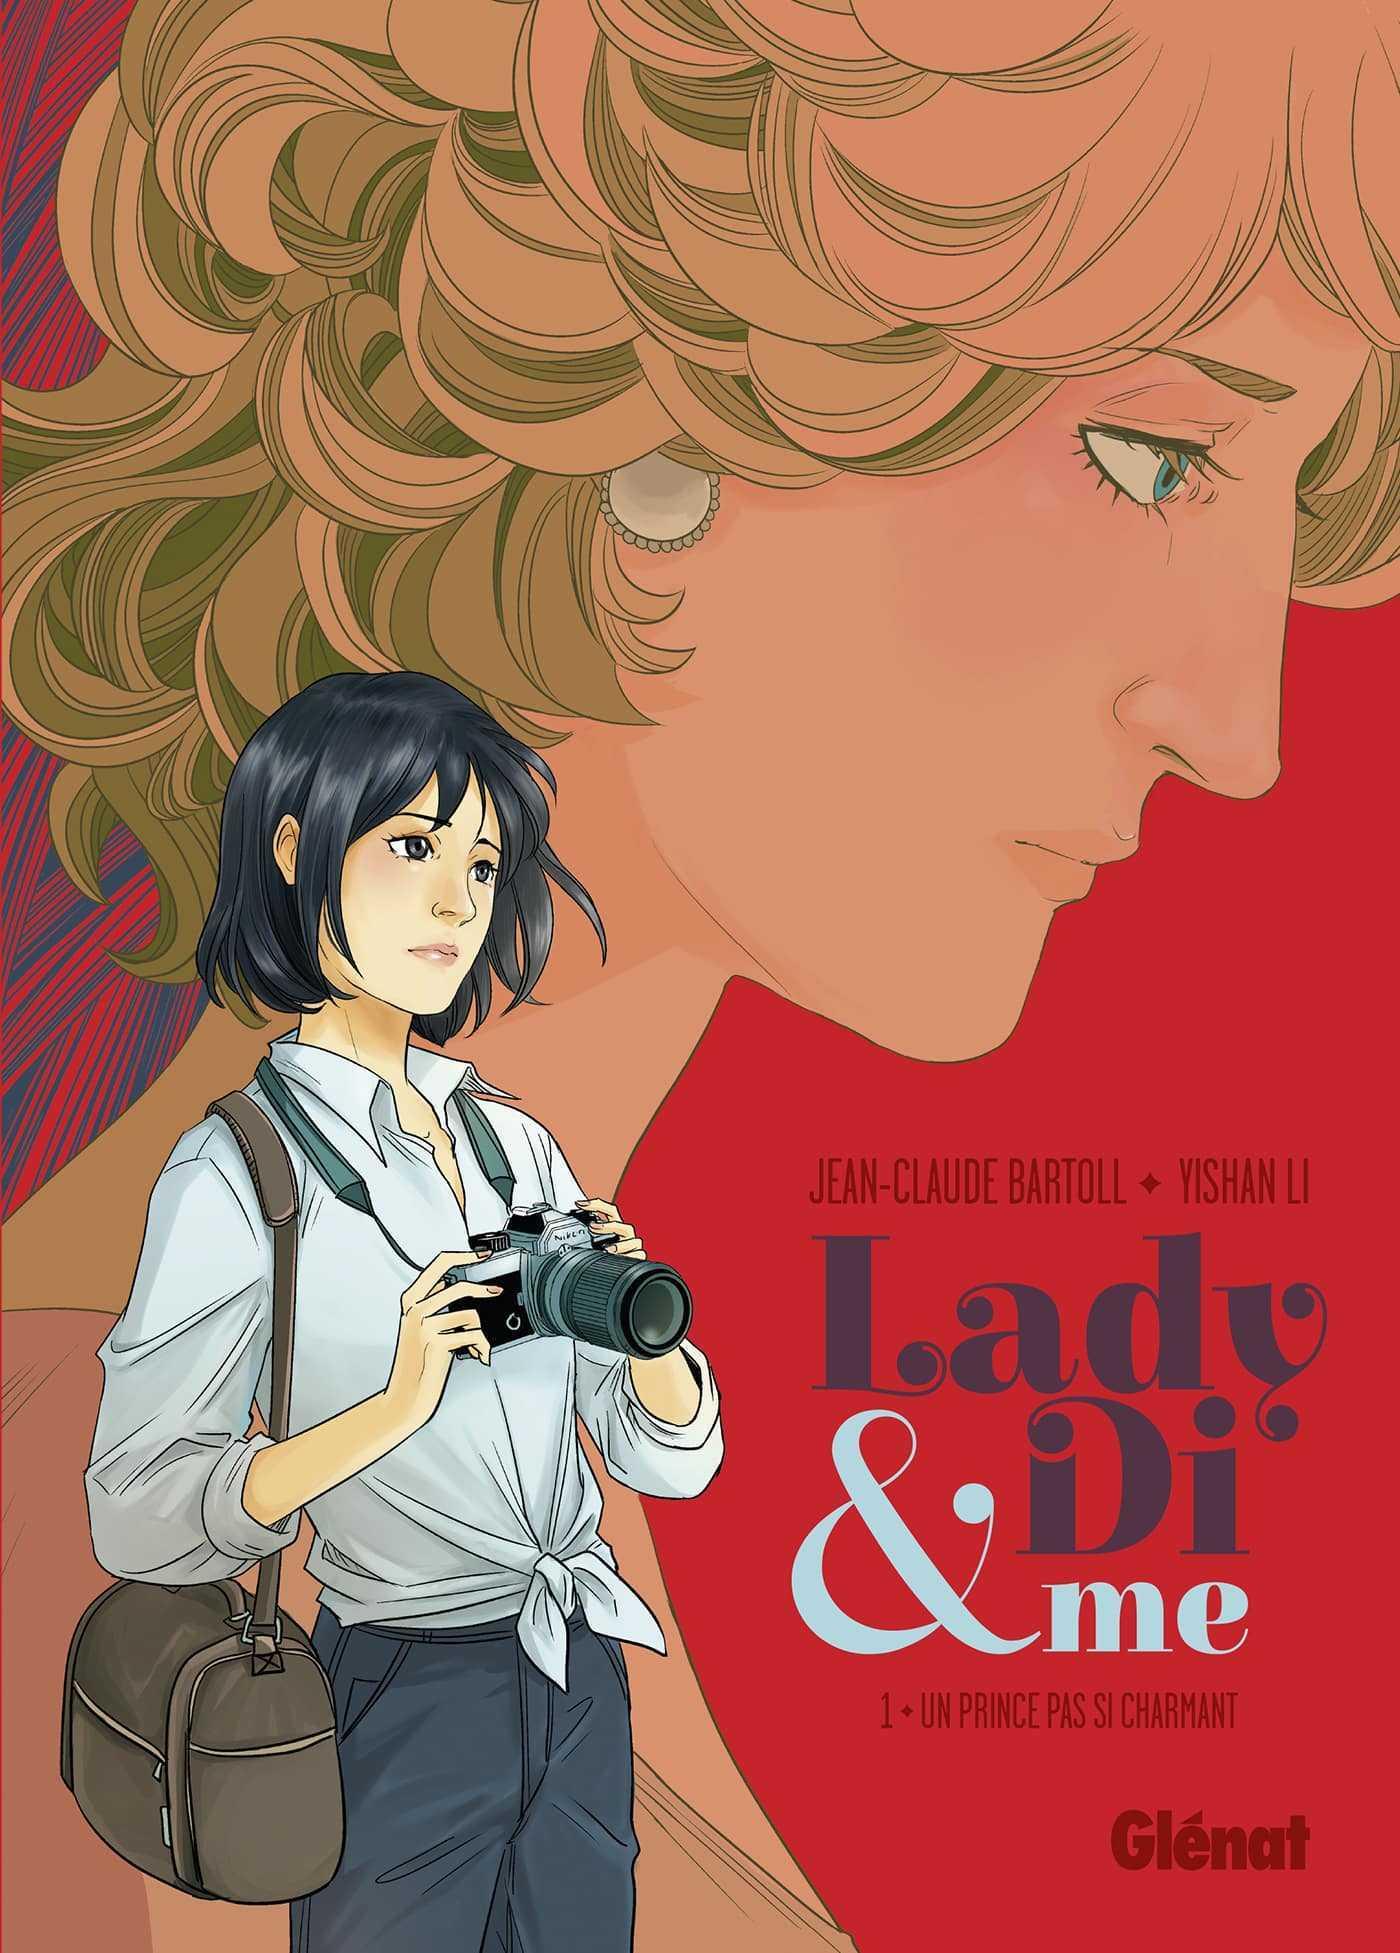 Lady Di & me, meurtre ou accident ?